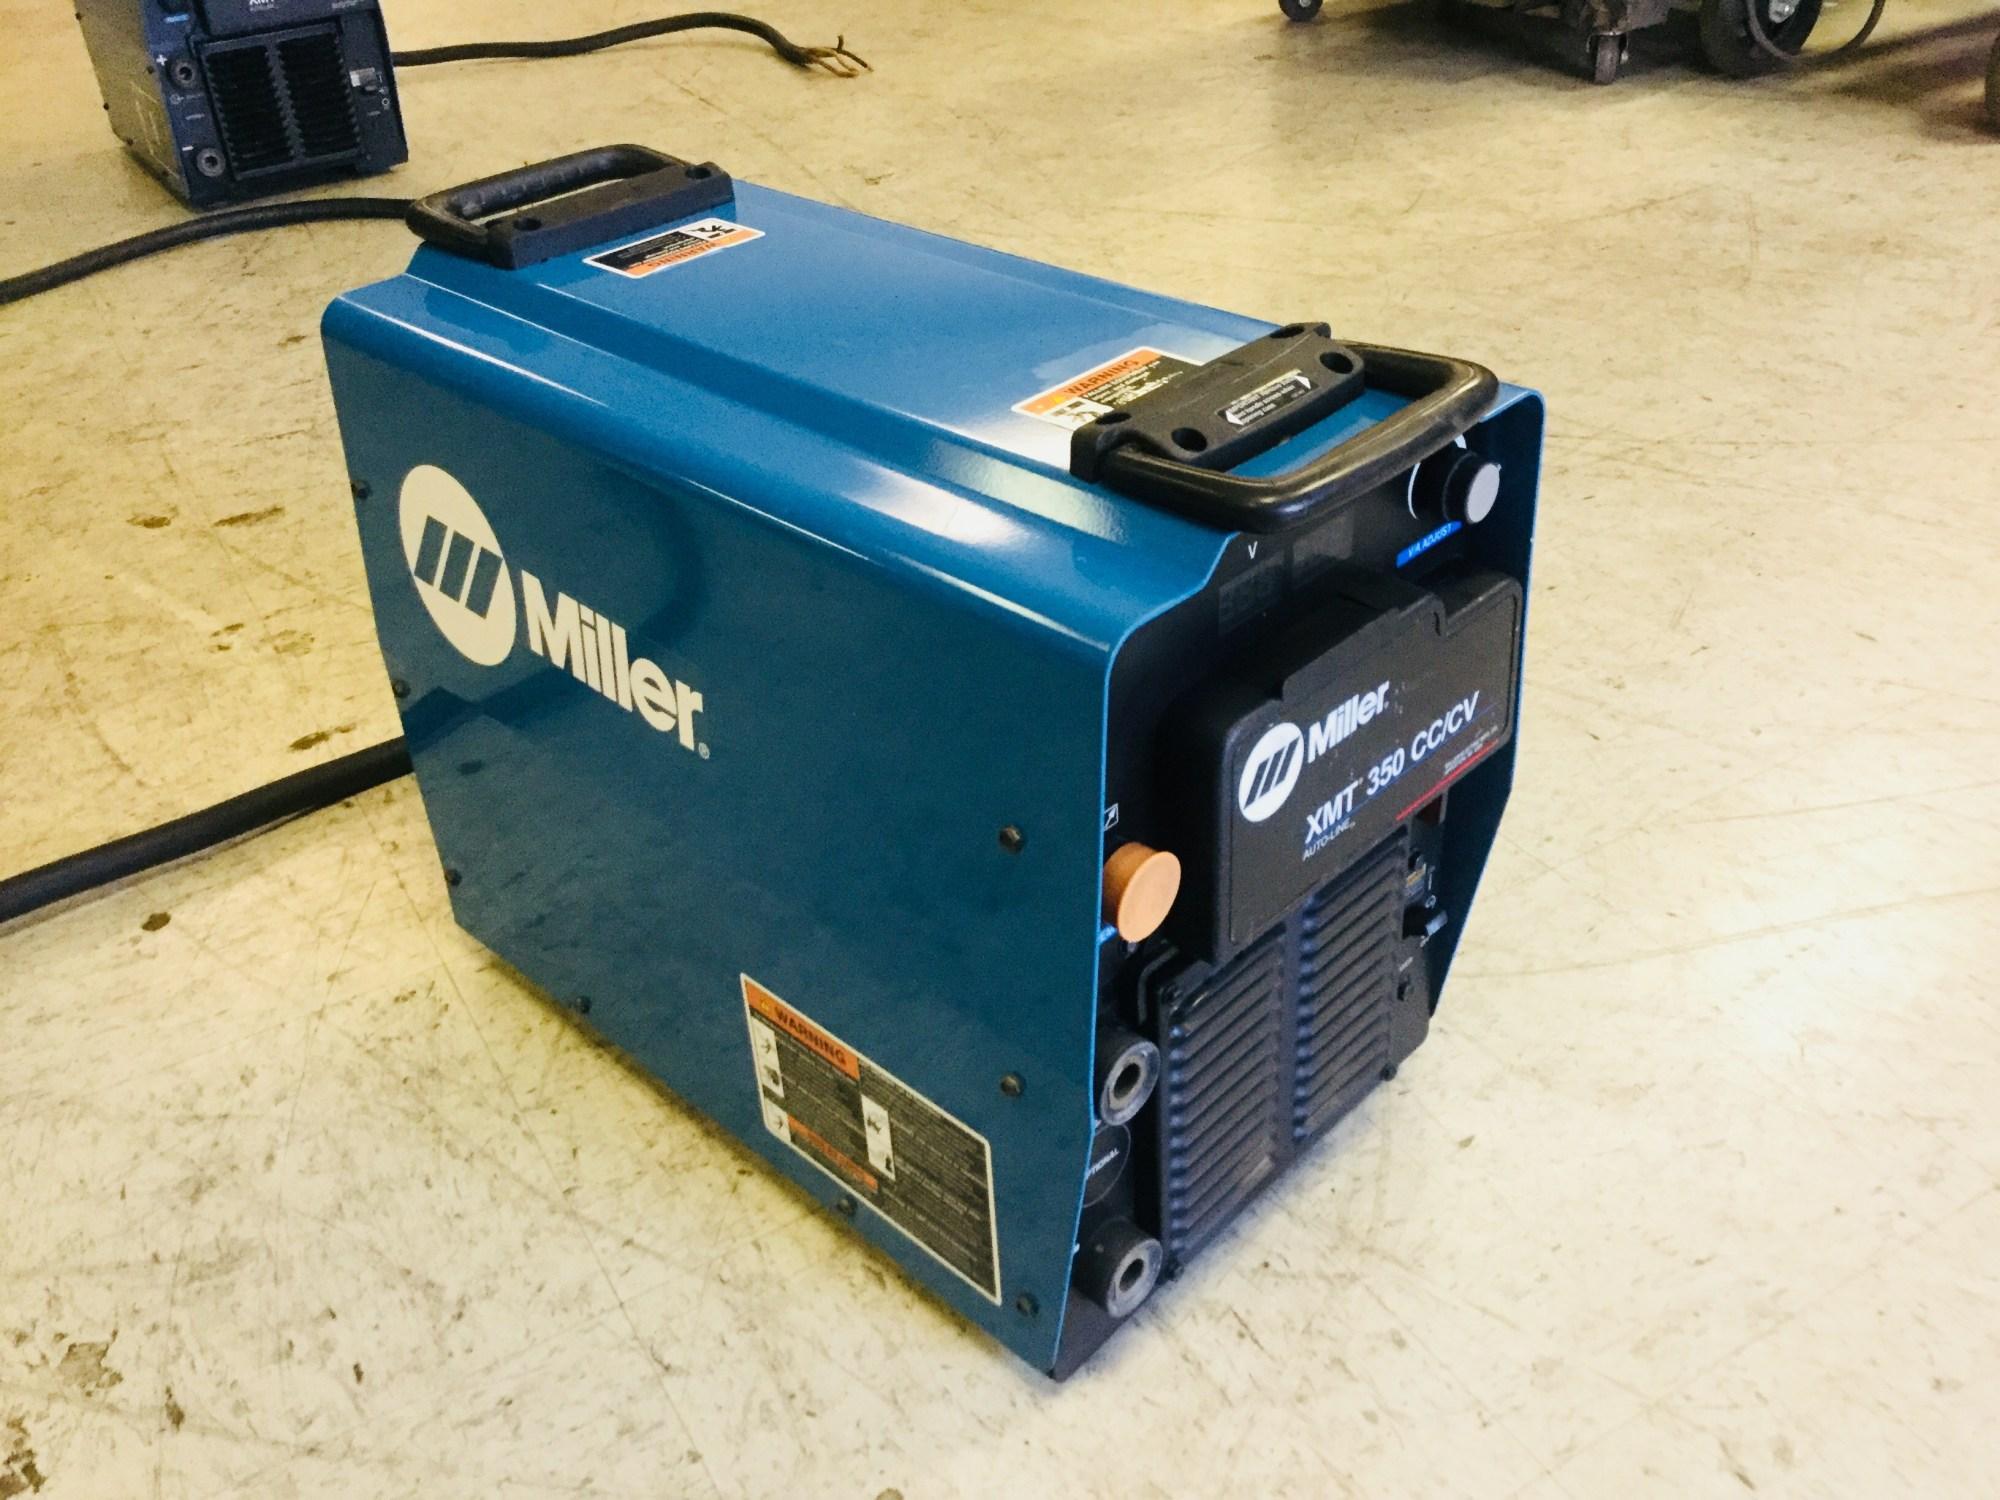 hight resolution of  miller coolmate miller xmt 350 cc cv multiprocess welder arc heat on miller suitcase miller wire